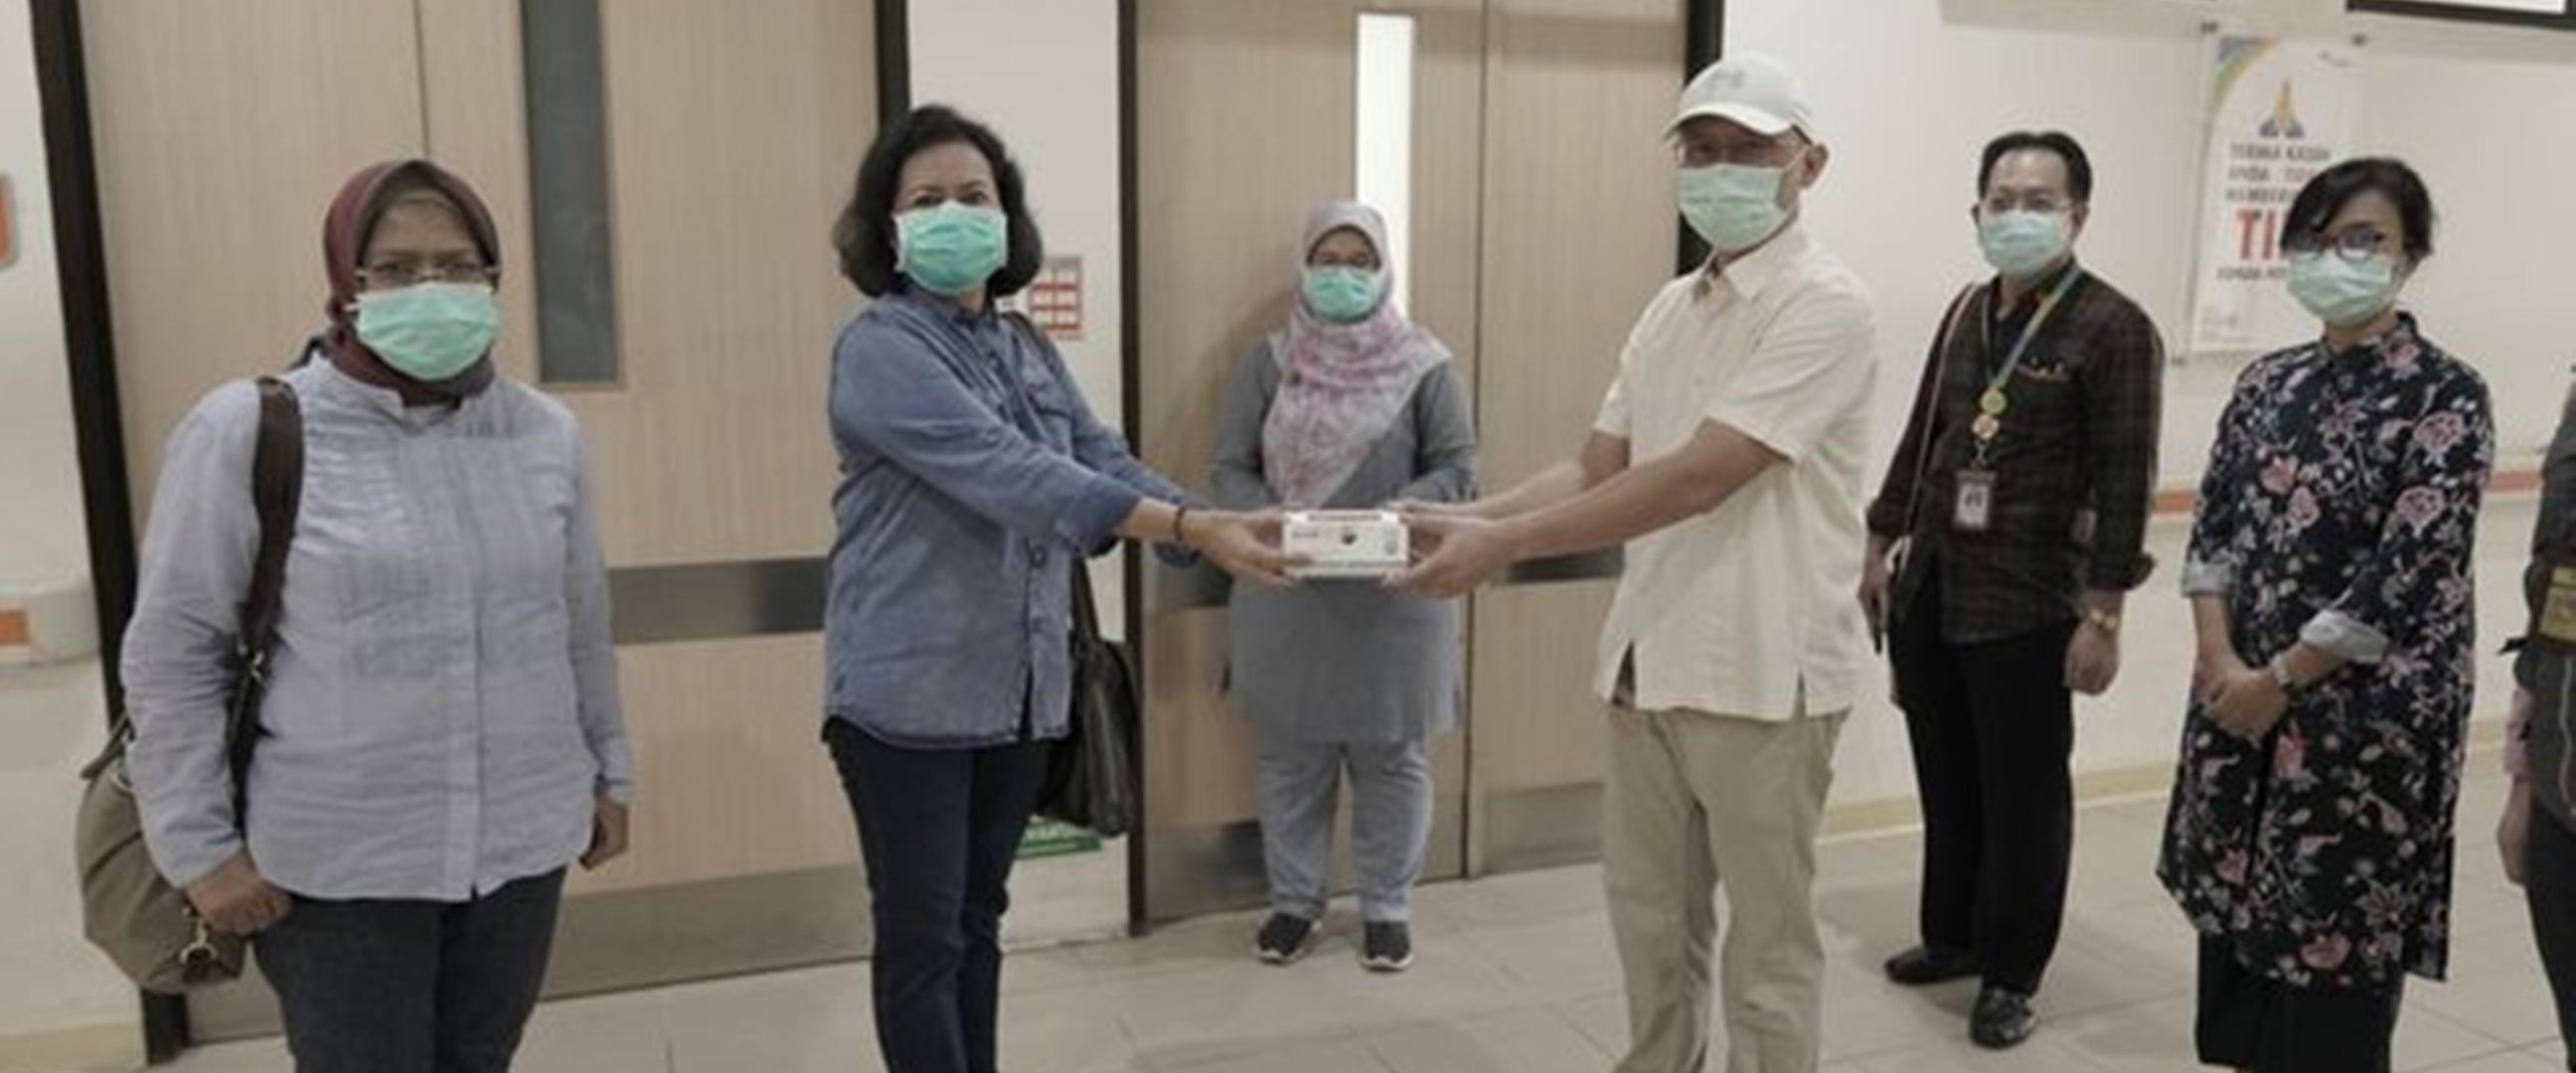 Satu bulan, 11 pasien corona di Jawa Barat sembuh